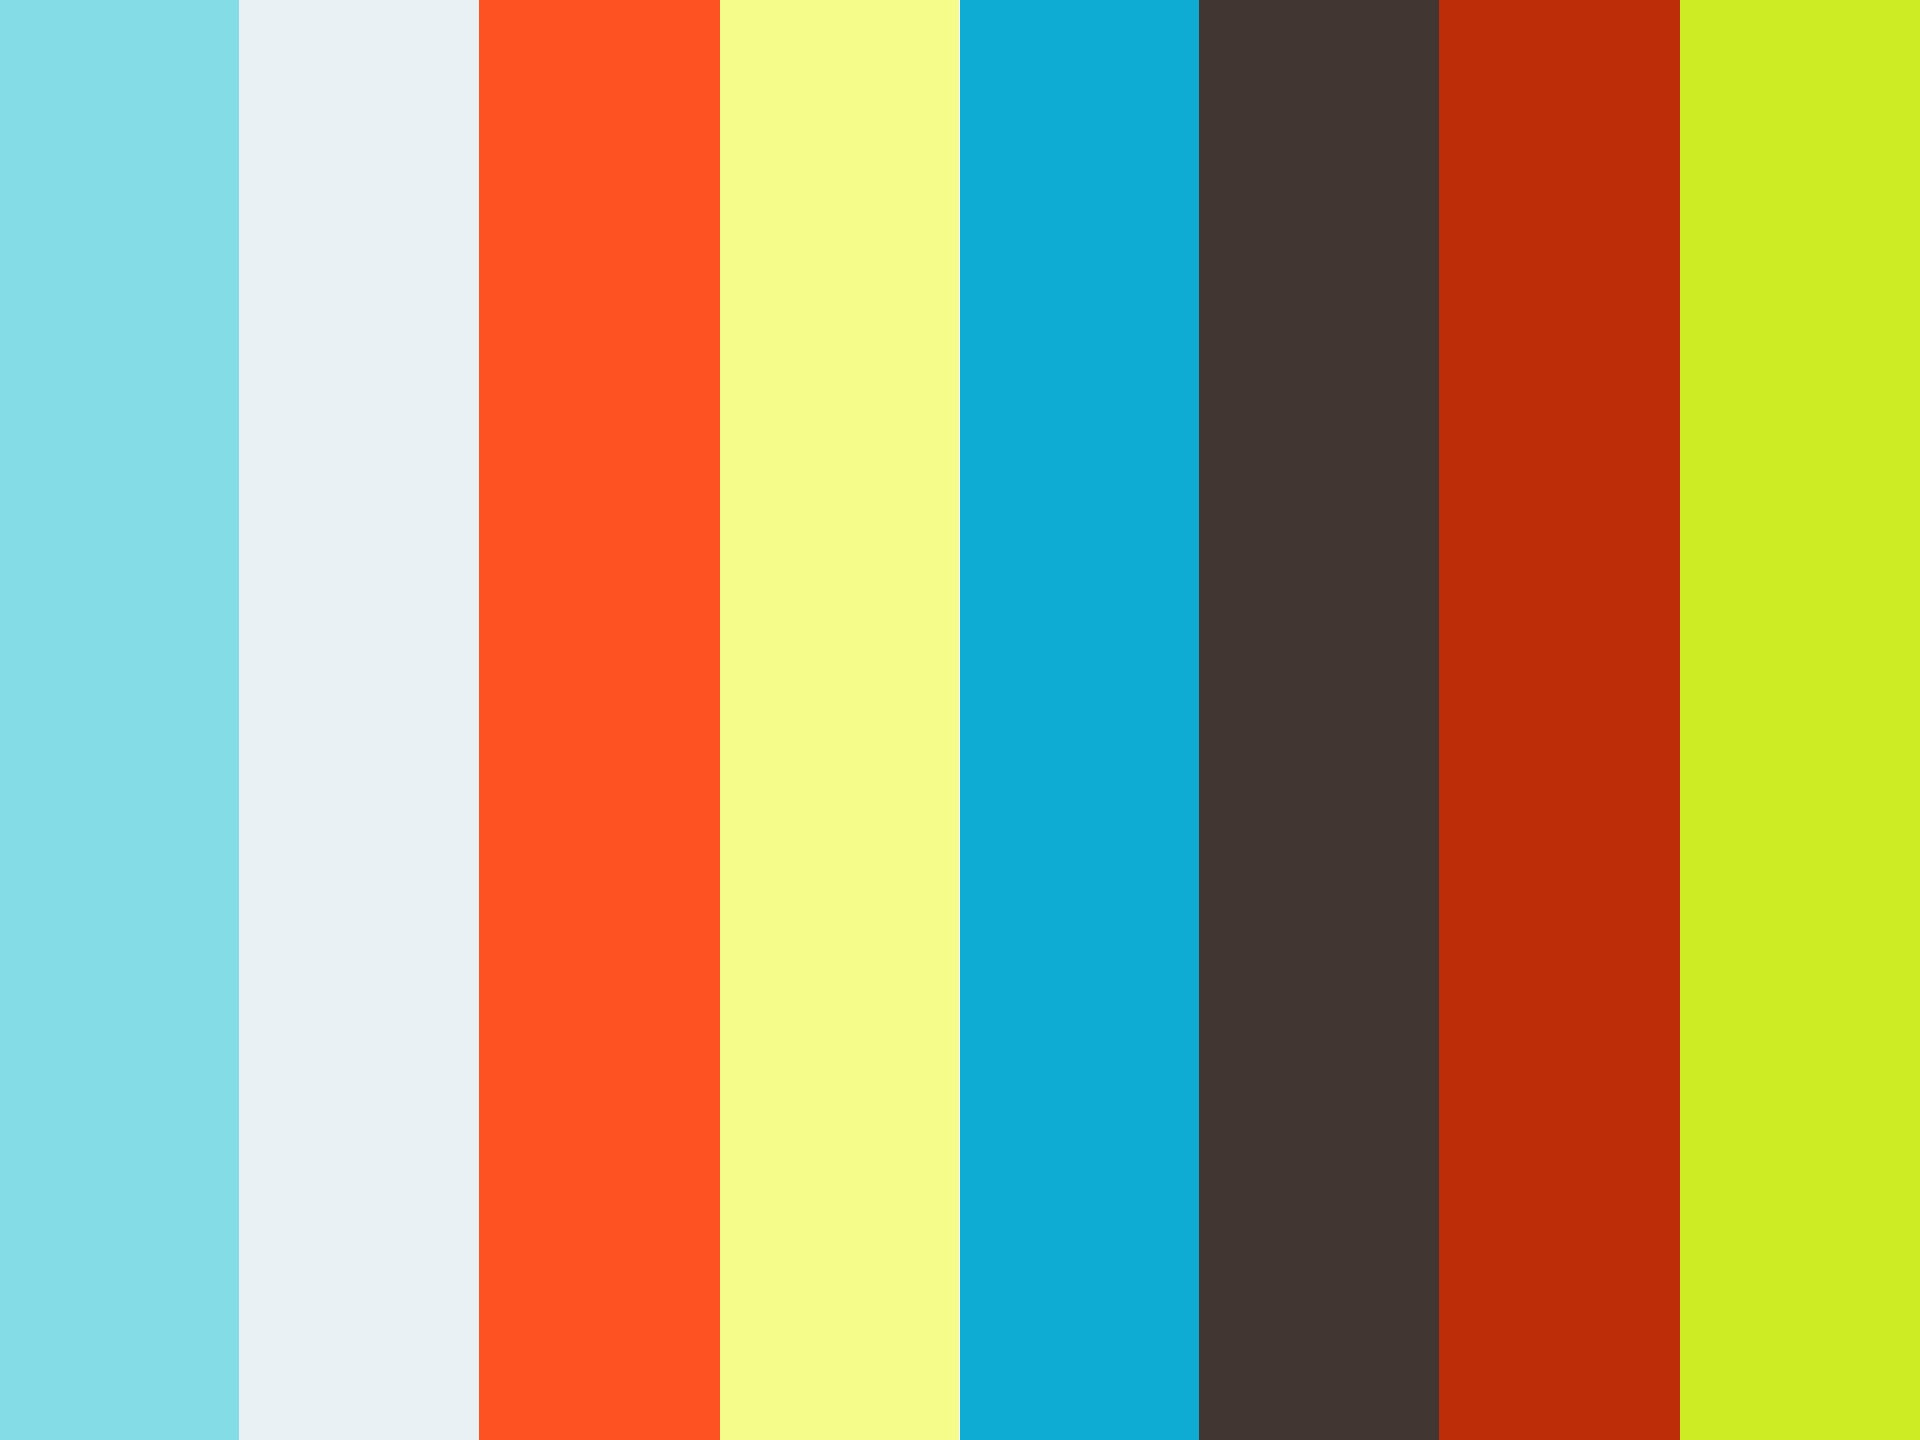 Sakuraジルコニアディスク 【User Voice】Sakuraジルコニアディスク(山﨑長郎先生)